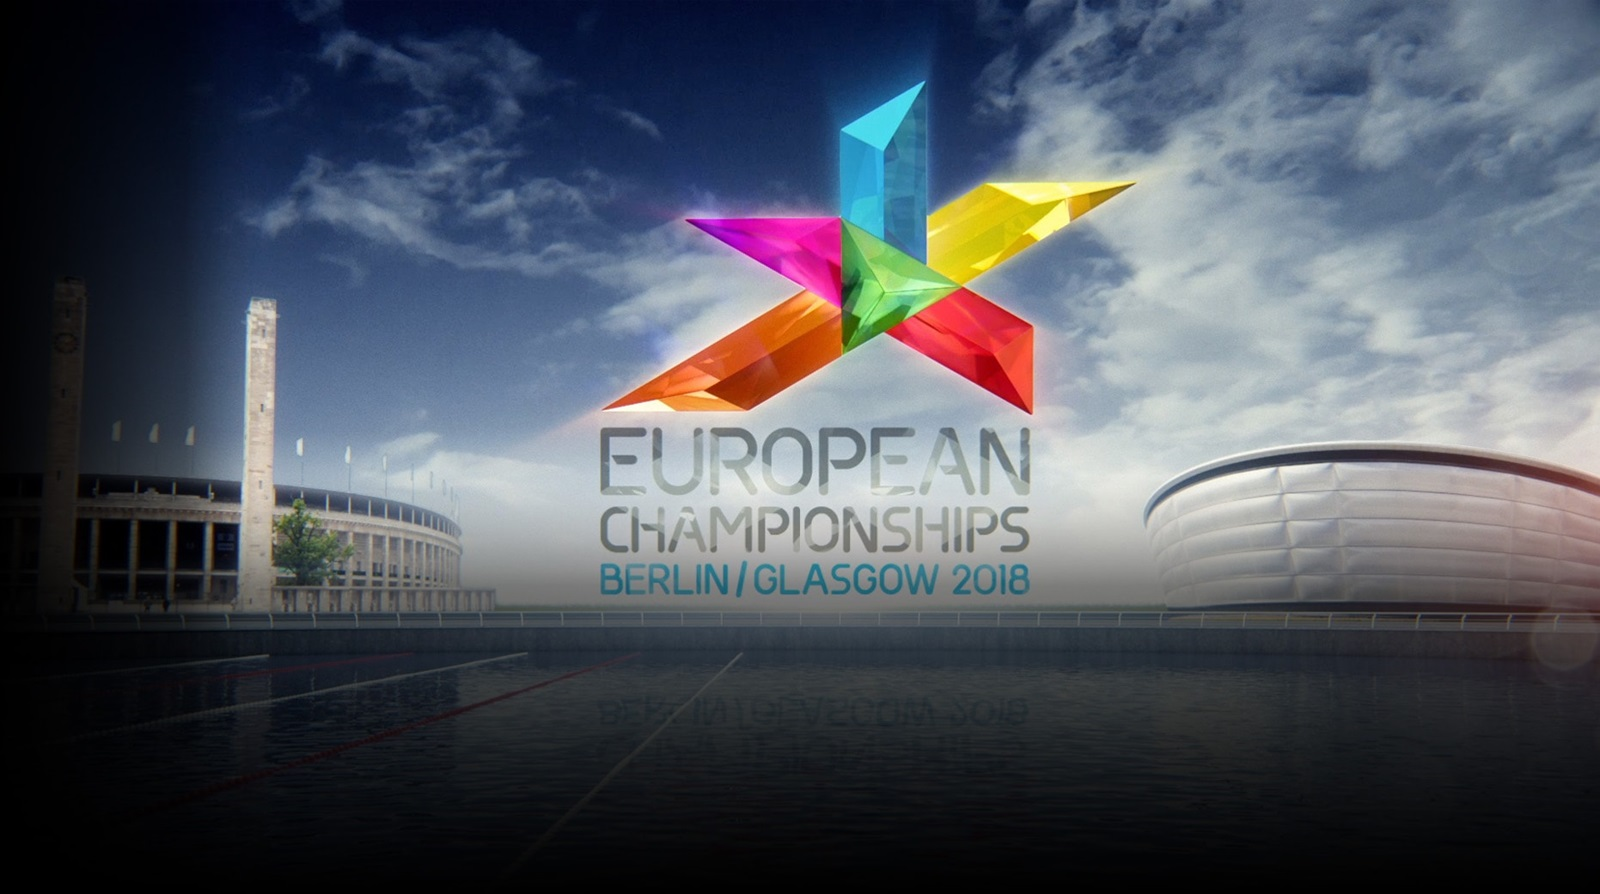 European Championship 2018 Customer Story Hero with Shadow